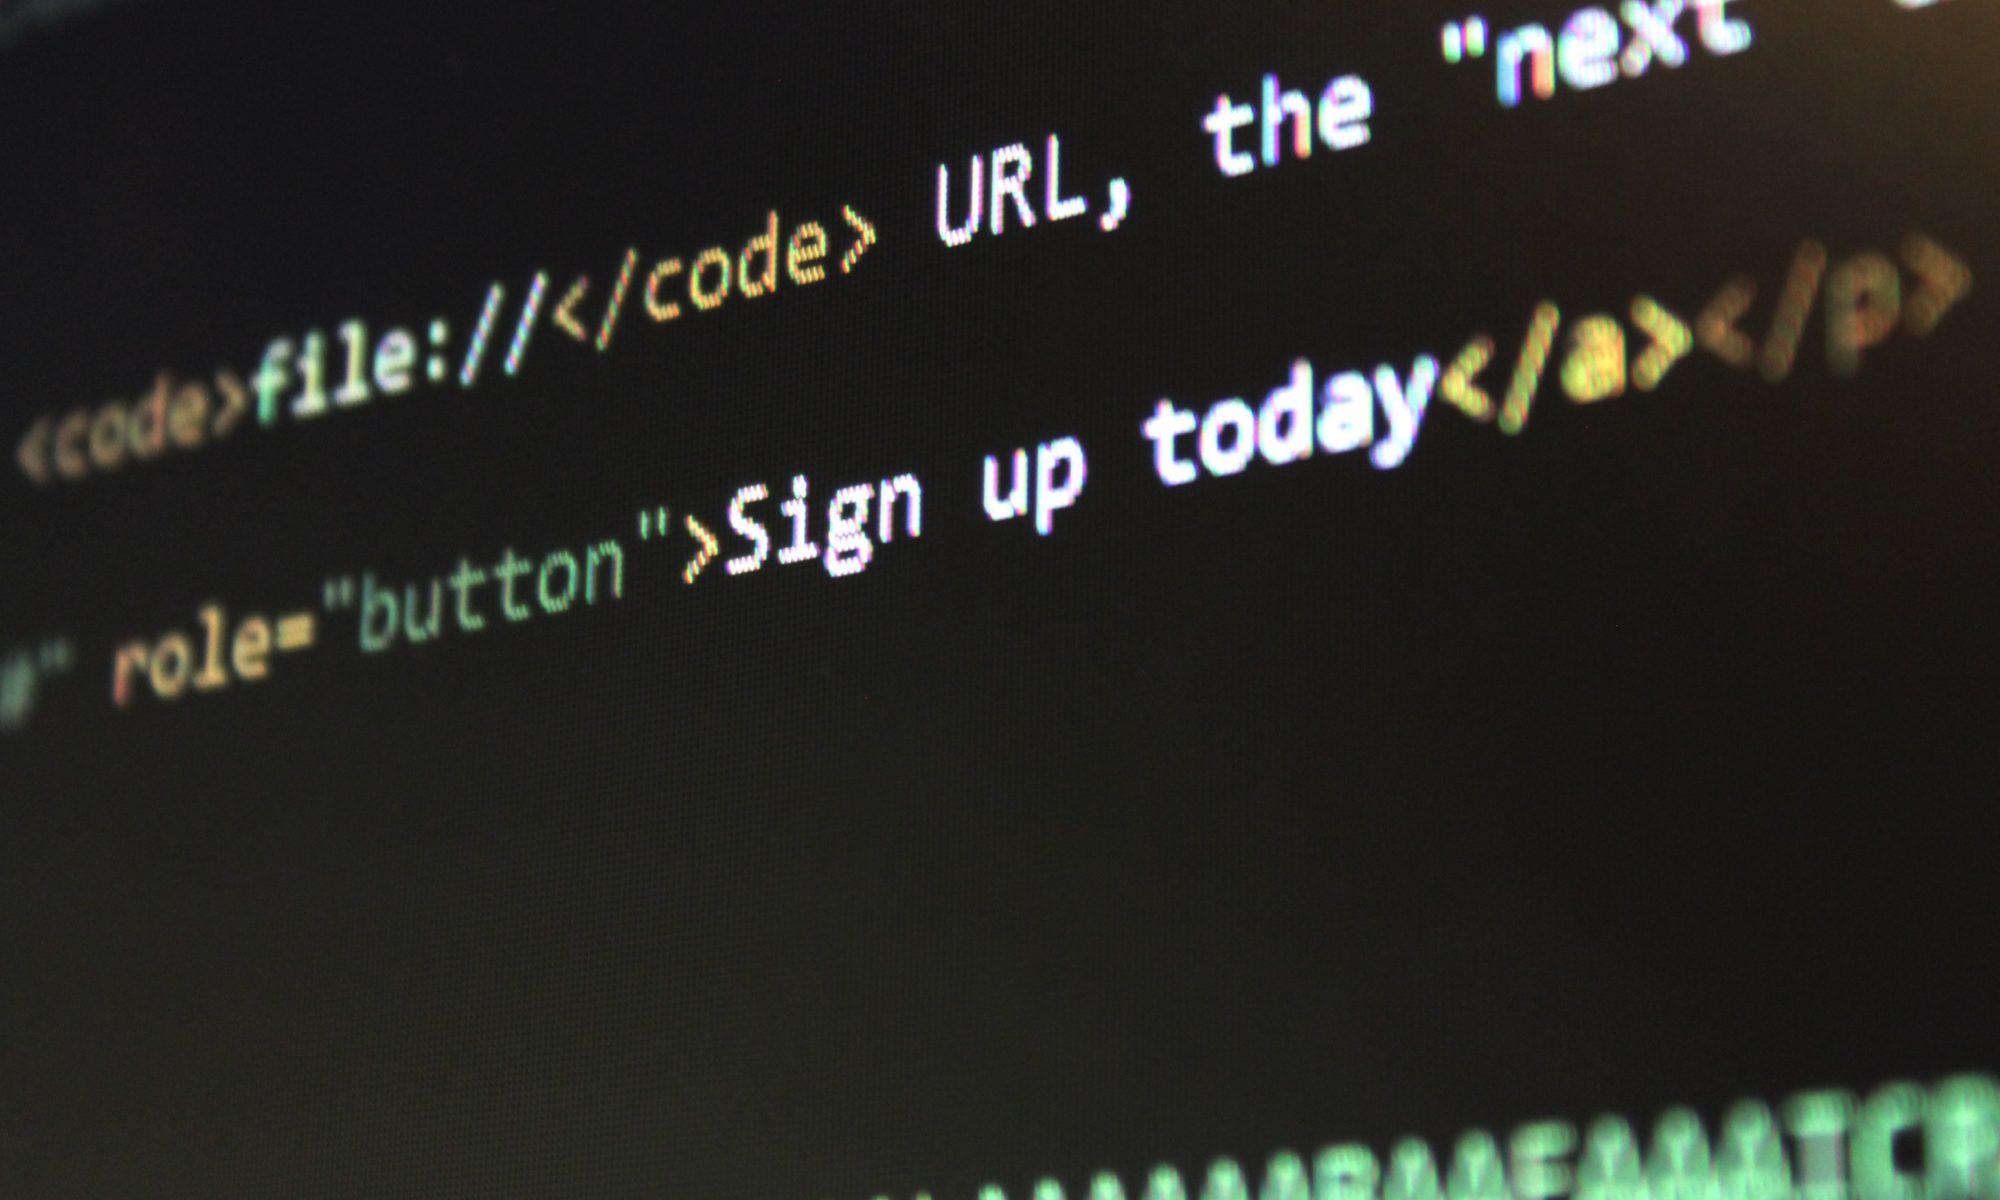 image of PC screen showing HTML code used in website design - Suffolk copywriting - Suffolk copywriter